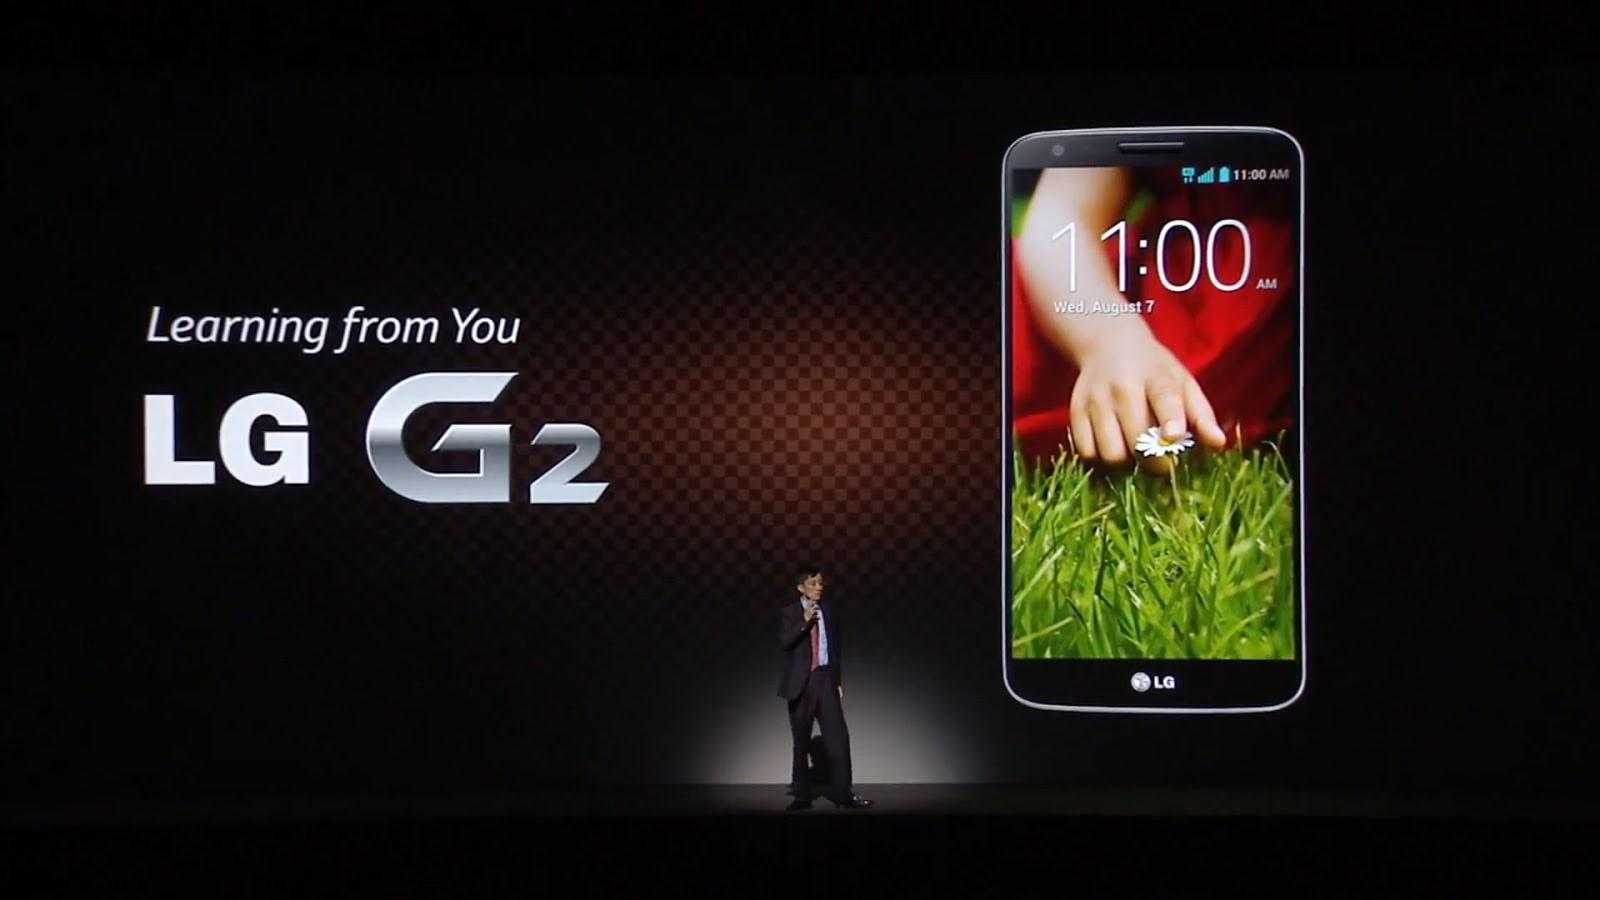 lg-g2-f320-hinh-anh